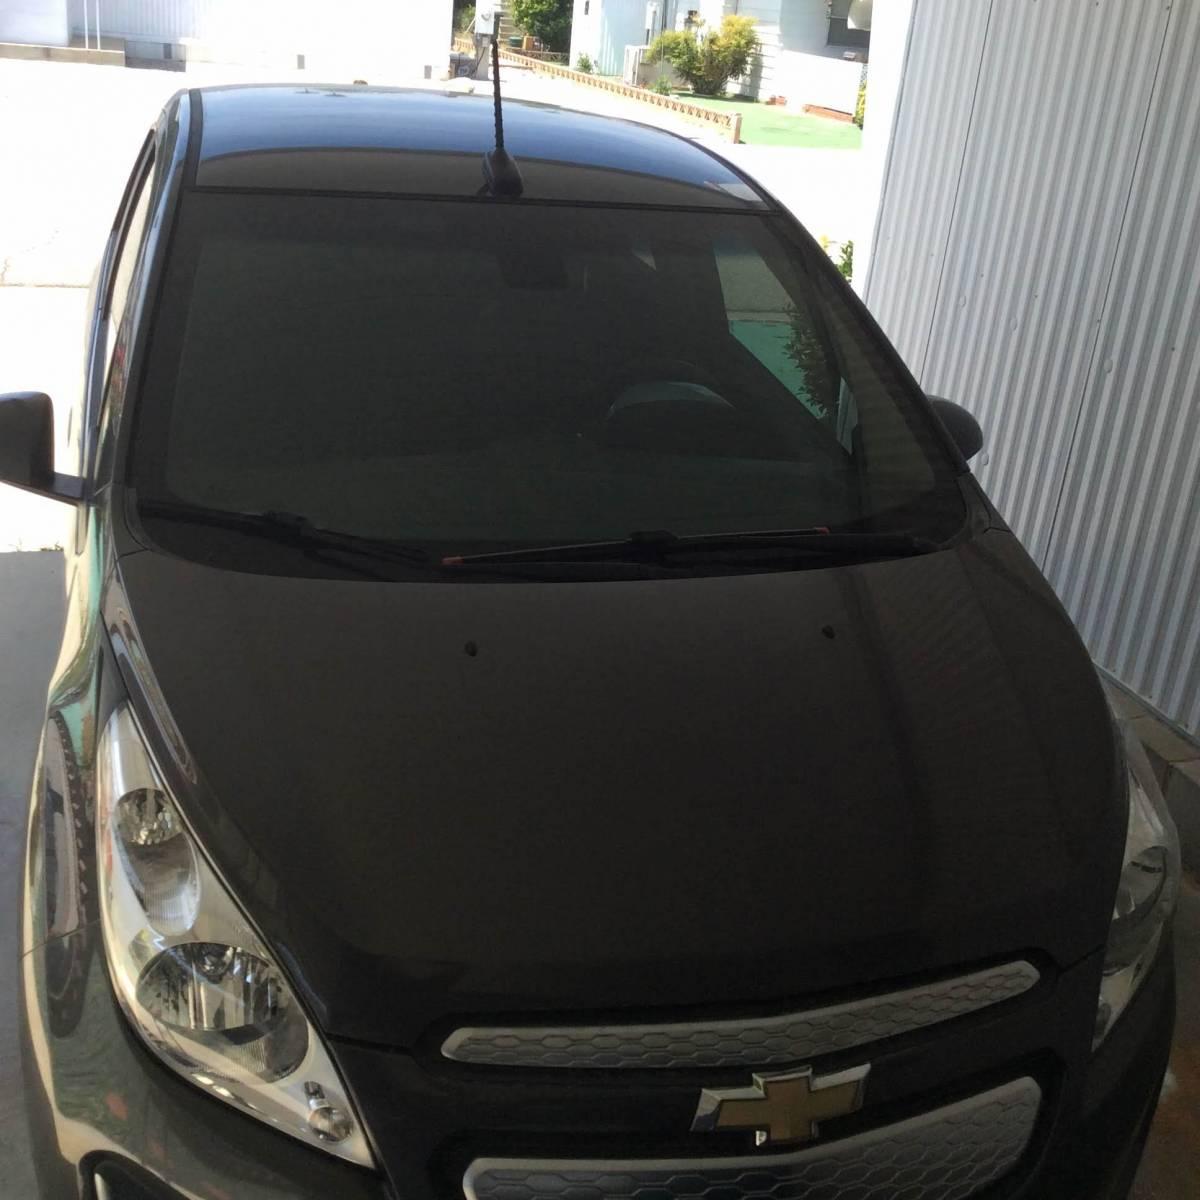 2014 Chevrolet Spark KL8CL6S00EC440545